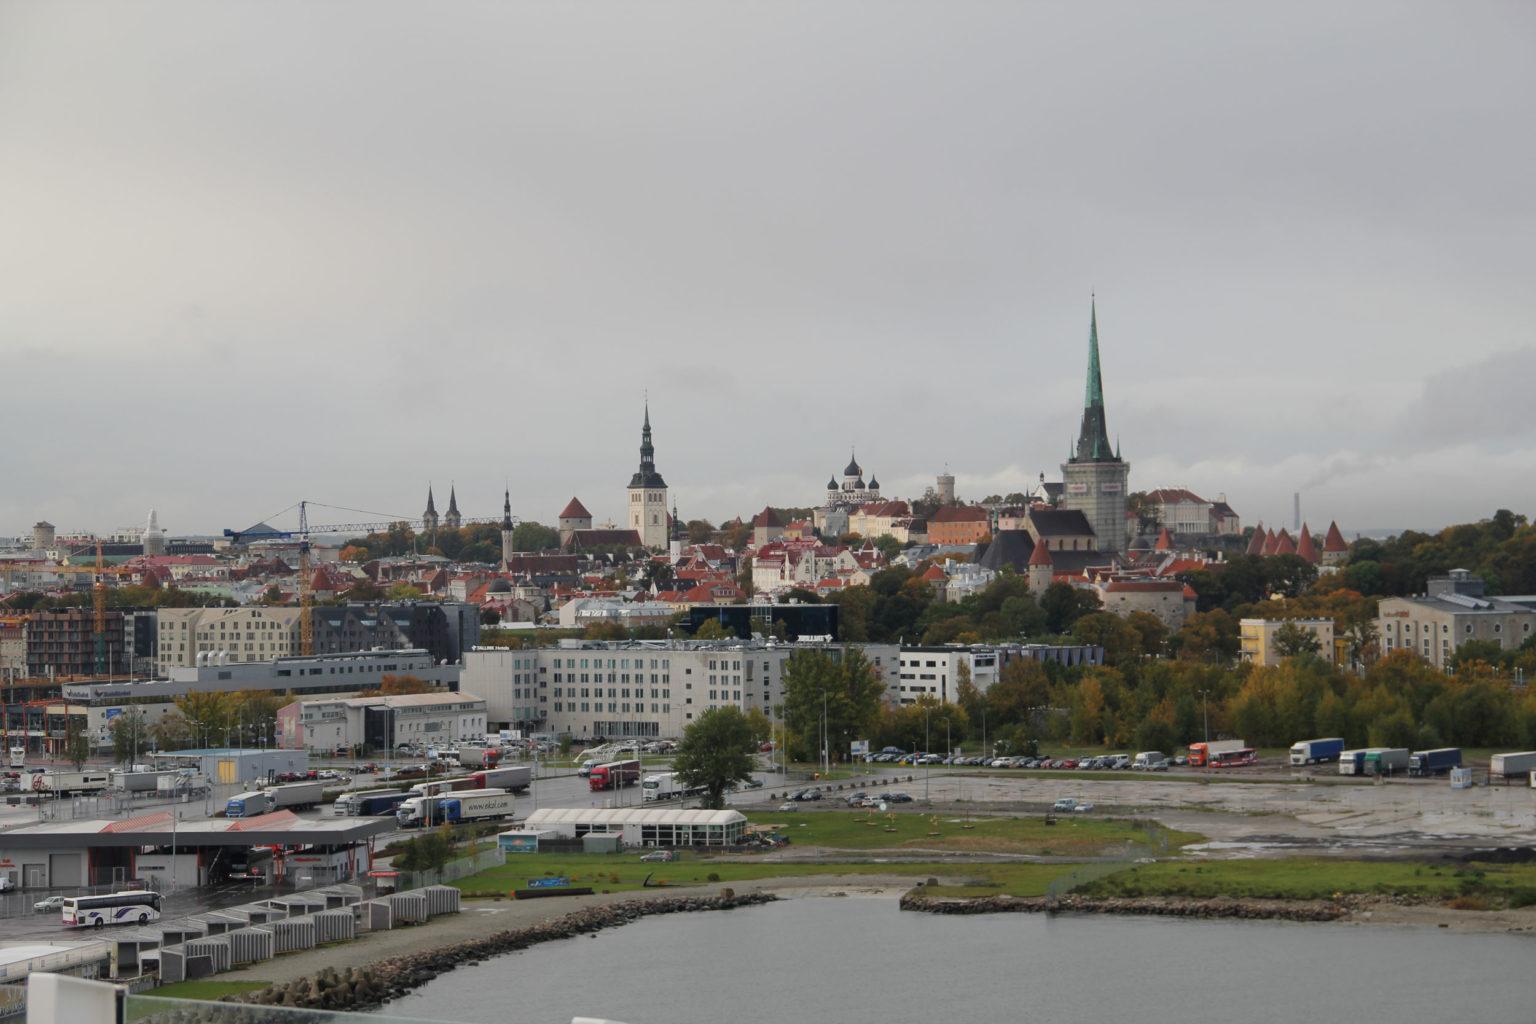 Tallinn Skypline